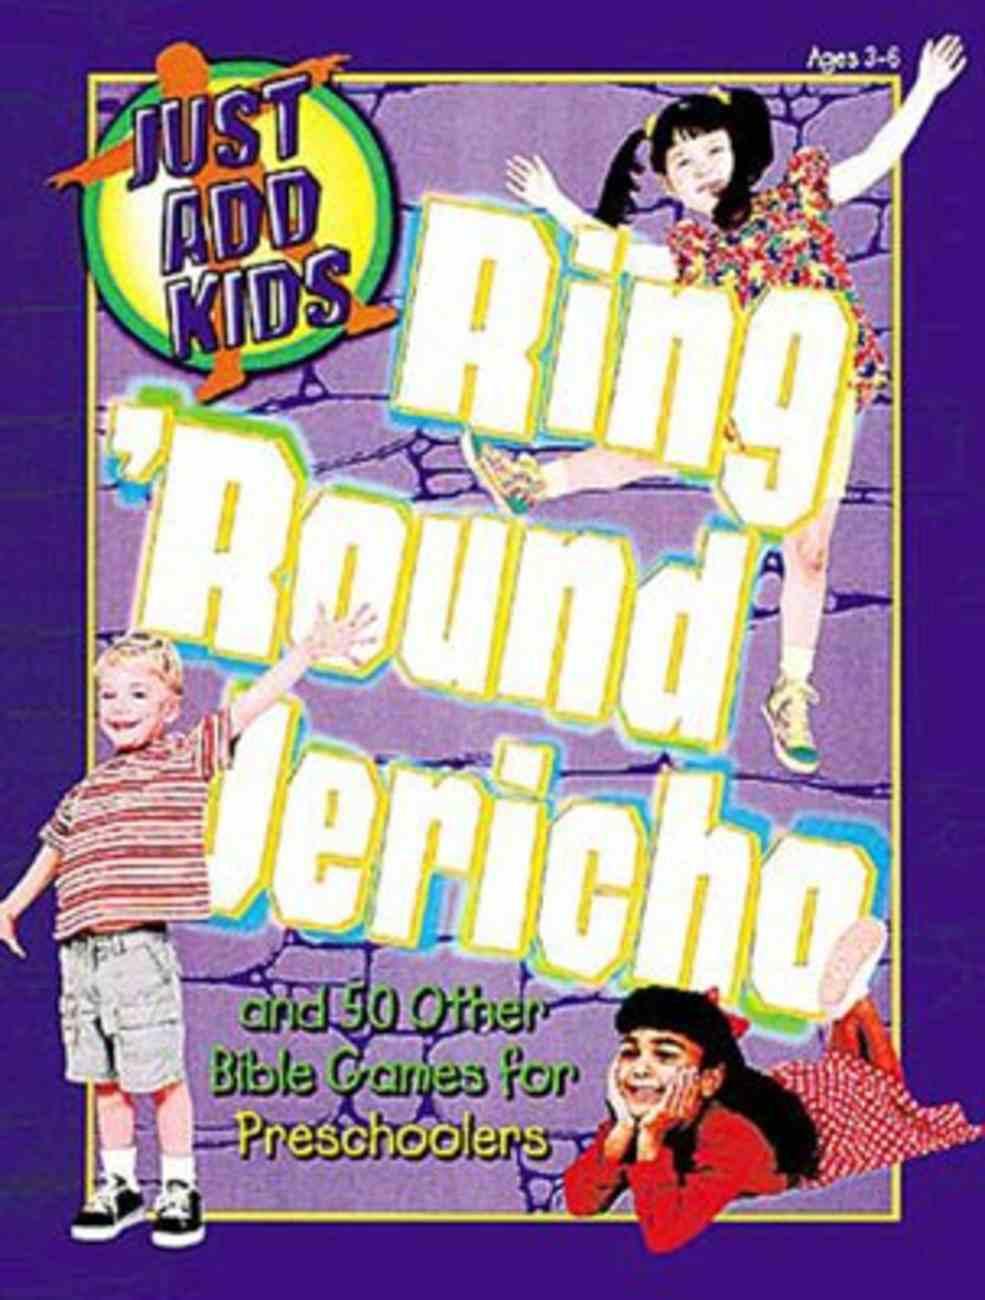 Just Add Kids: Ring 'Round Jericho Paperback